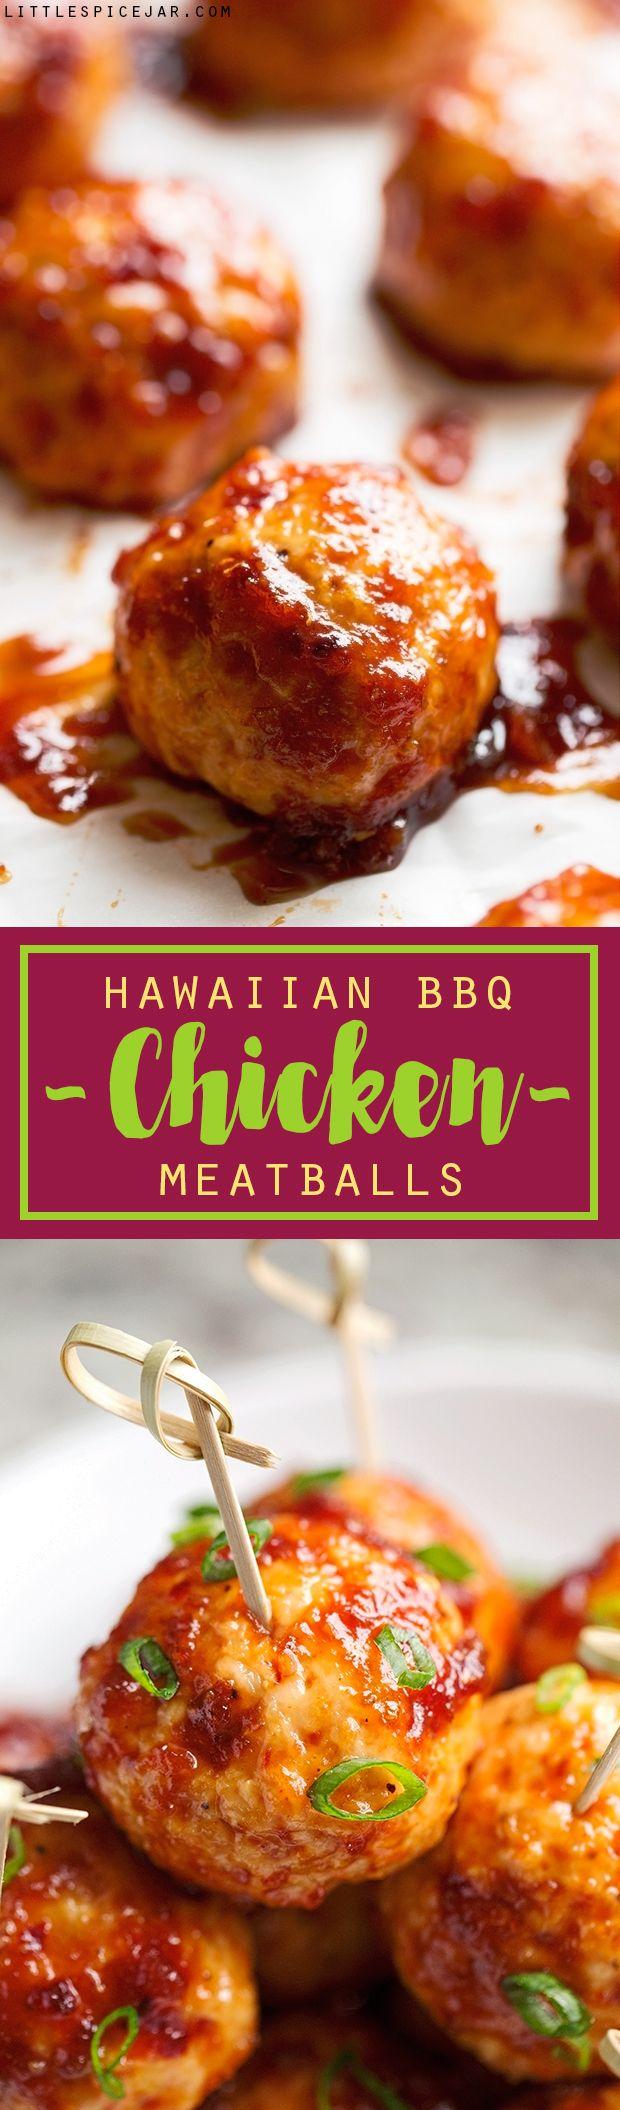 Hawaiian BBQ Chicken Meatballs - easy to make chicken meatballs covered in homemade hawaiian bbq sauce! #chickenmeatballs #meatballs #hawaiiianbbqsauce   Littlespicejar.com